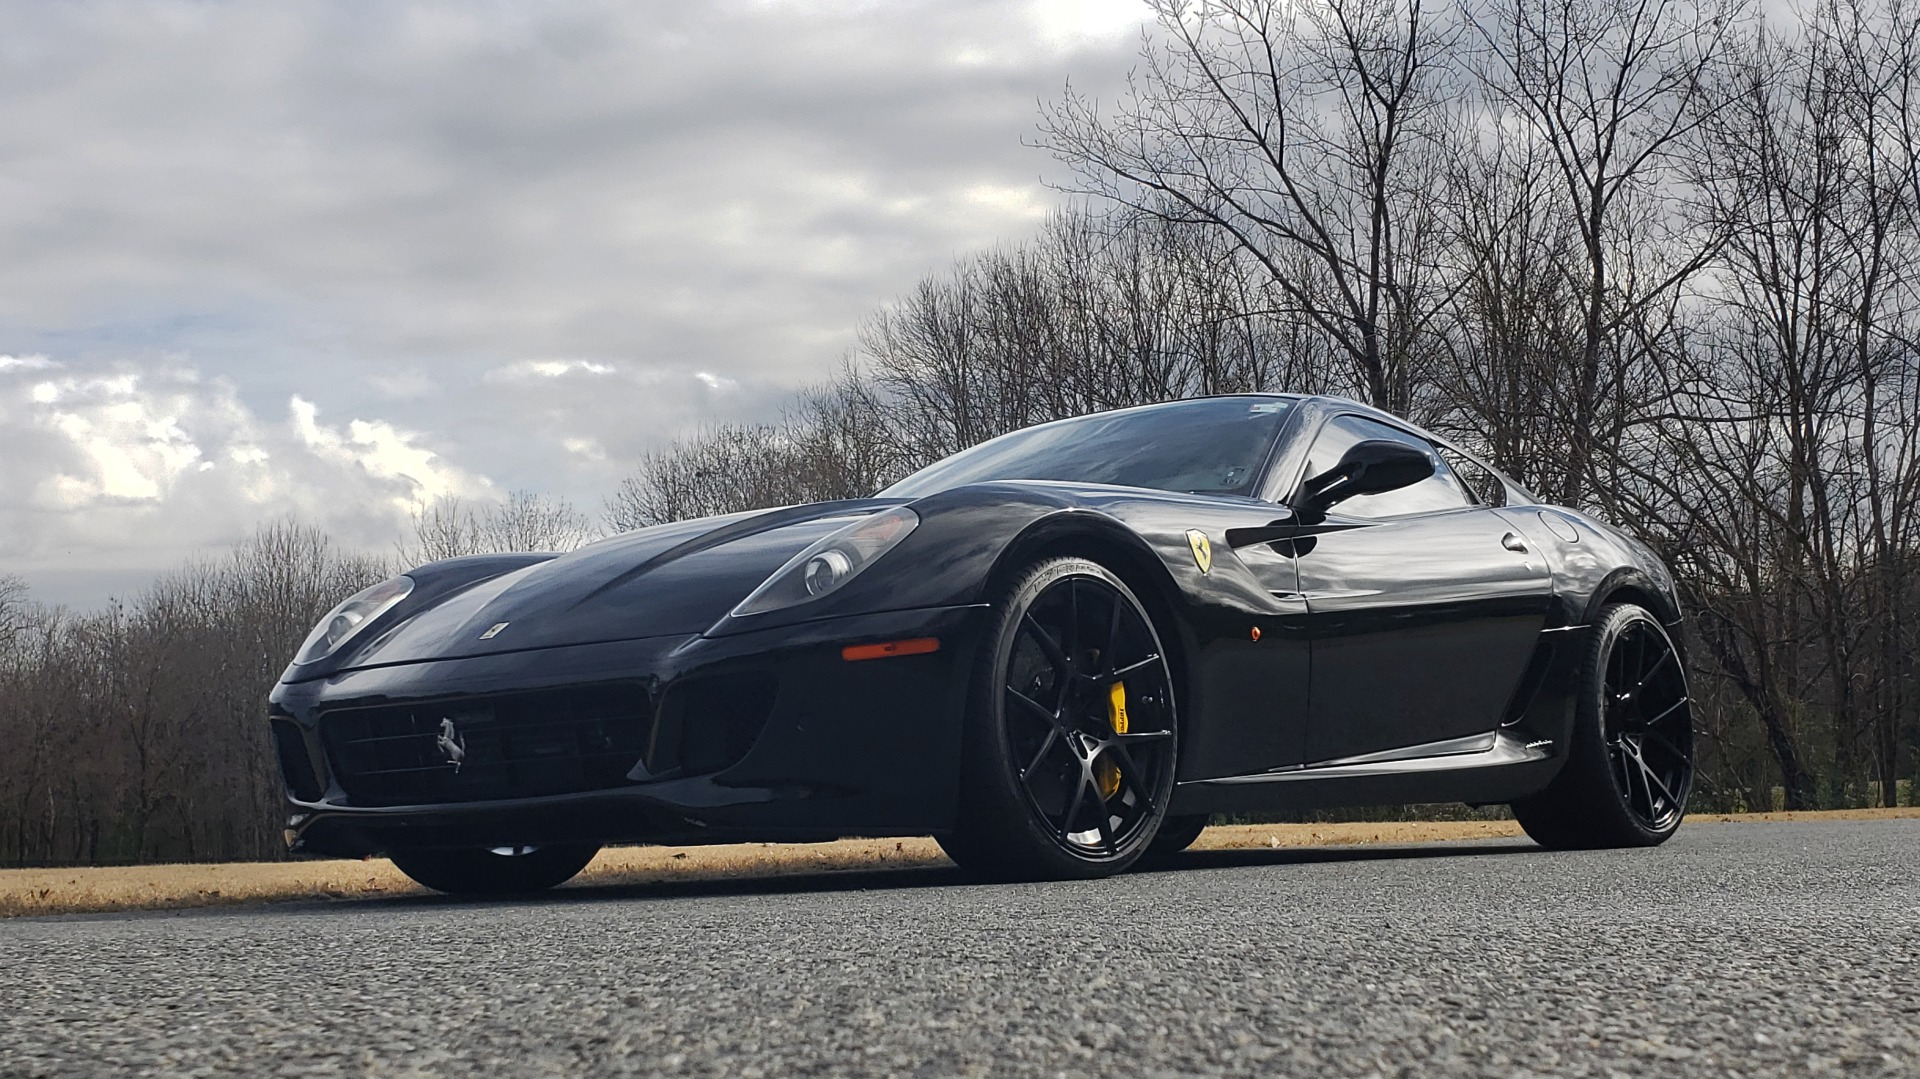 Used 2007 Ferrari 599 GTB FIORANO HGTE / V12 / F1 TRANS / NAV / BOSE / CUSTOM WHEELS for sale $109,999 at Formula Imports in Charlotte NC 28227 5